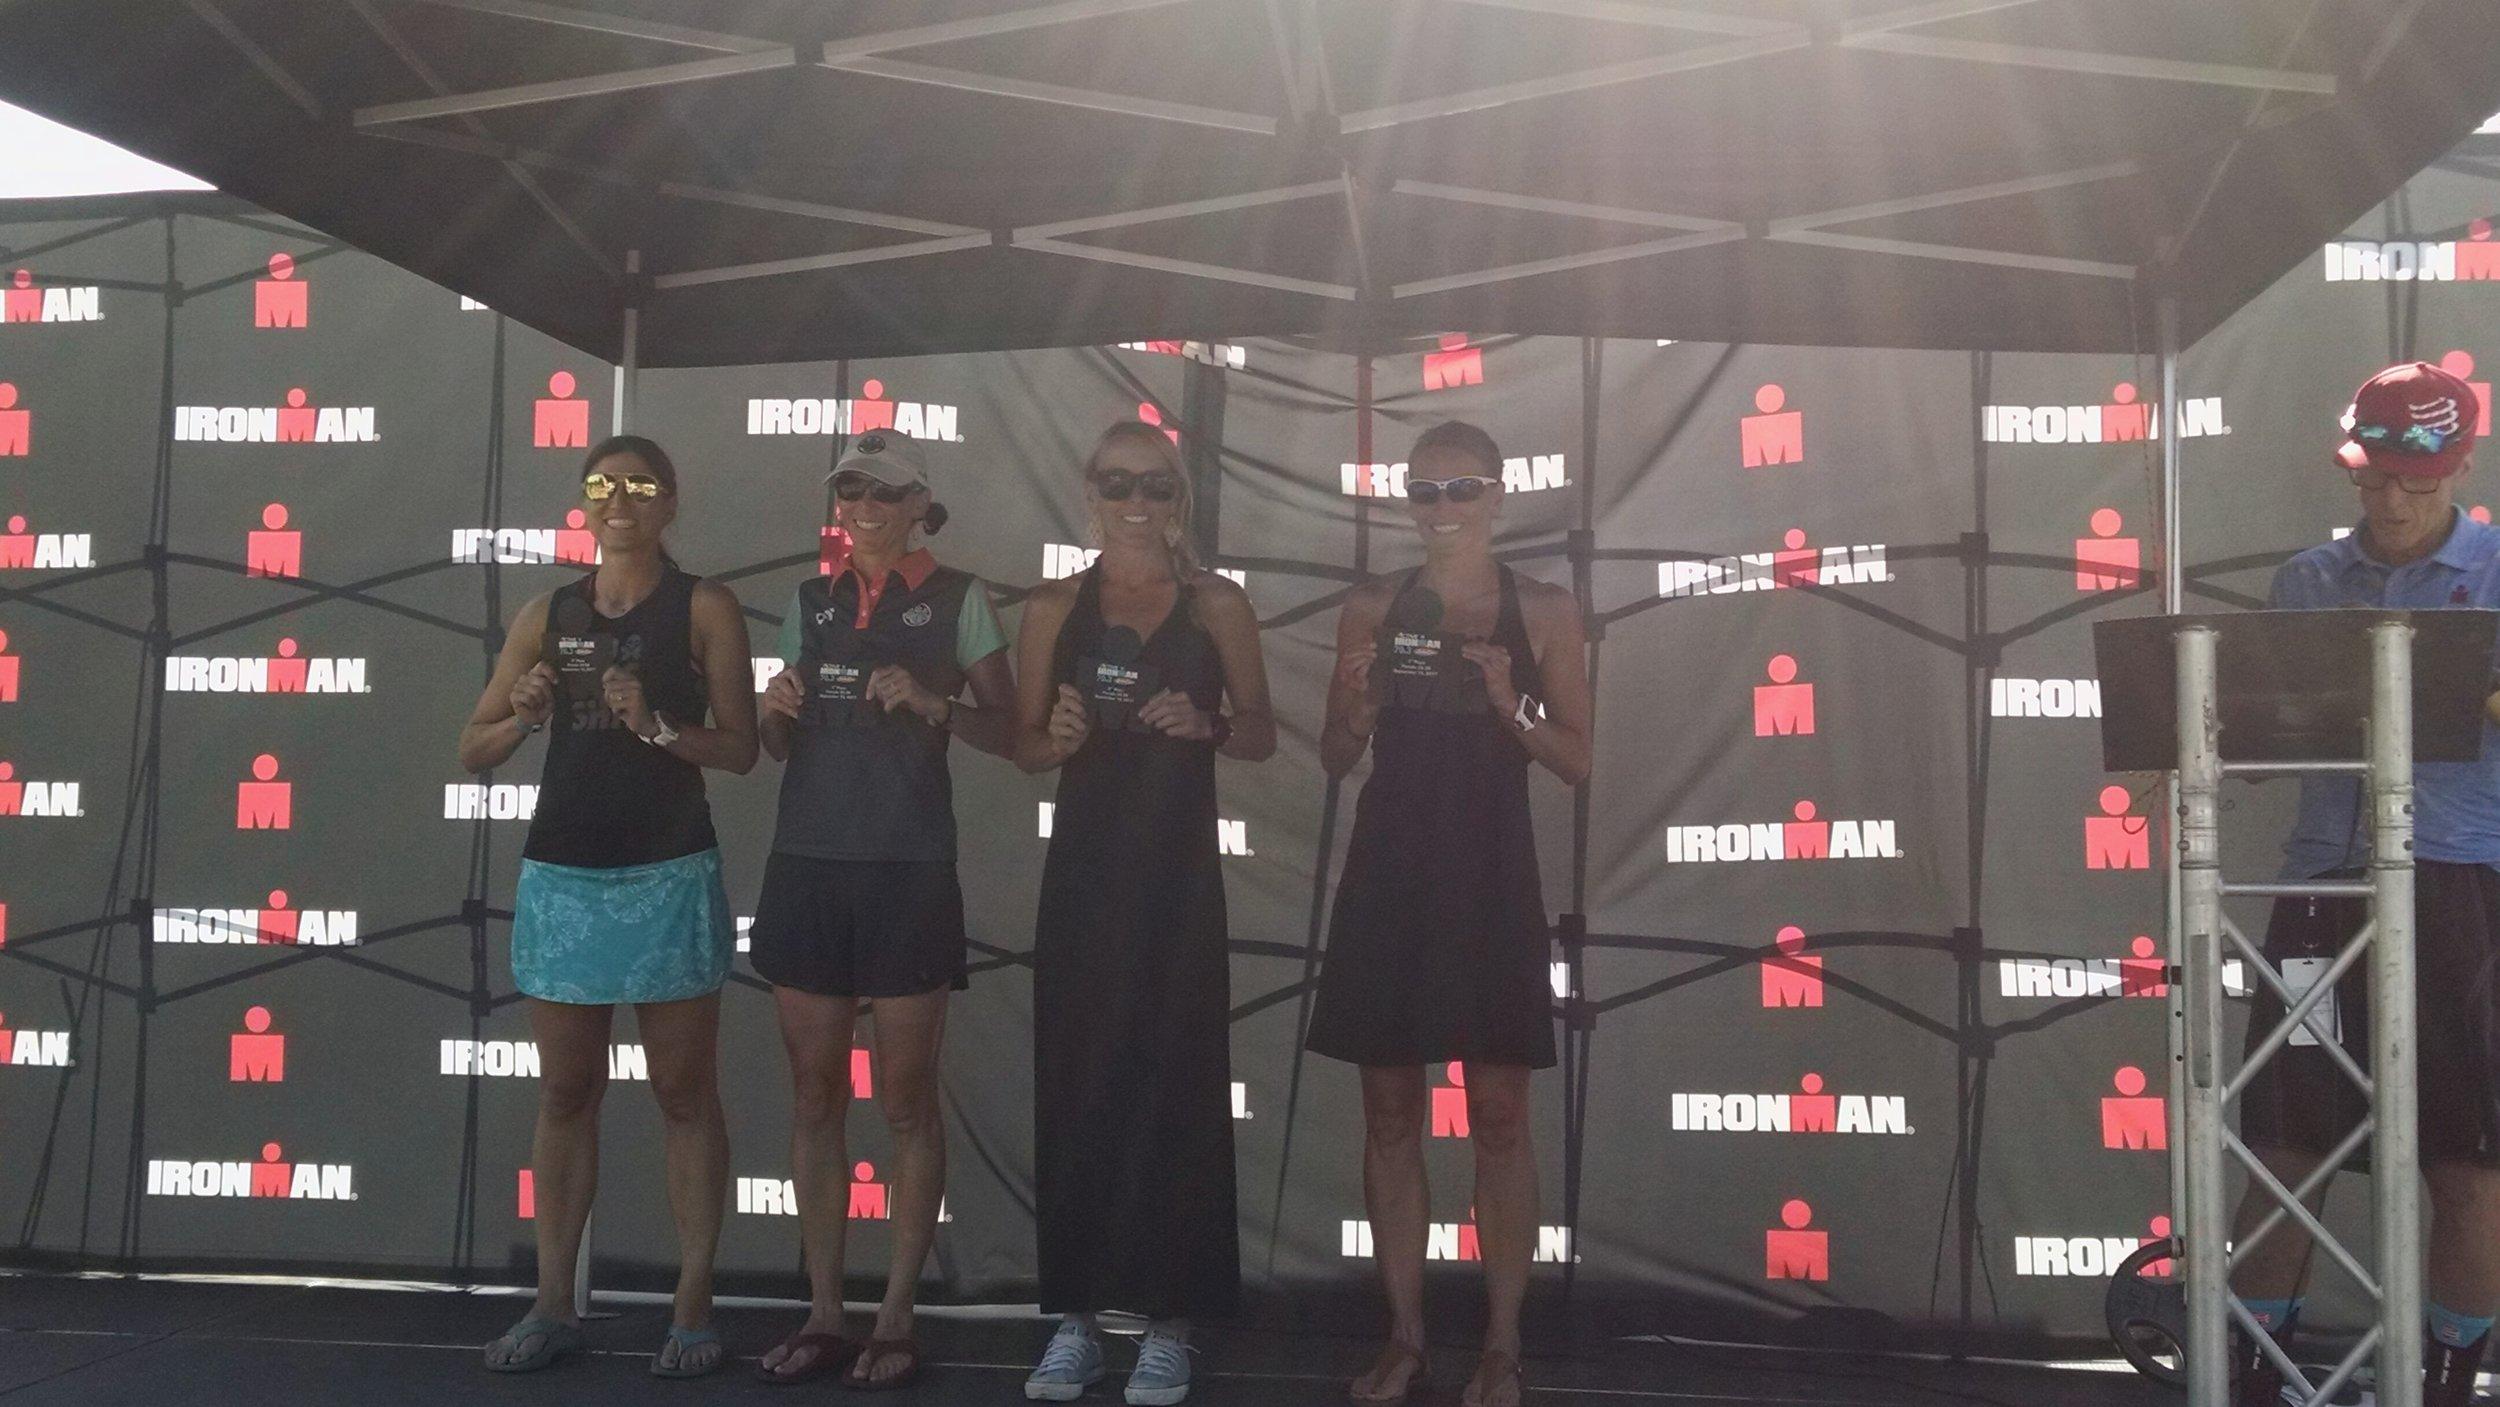 The podium at Santa Cruz 70.3